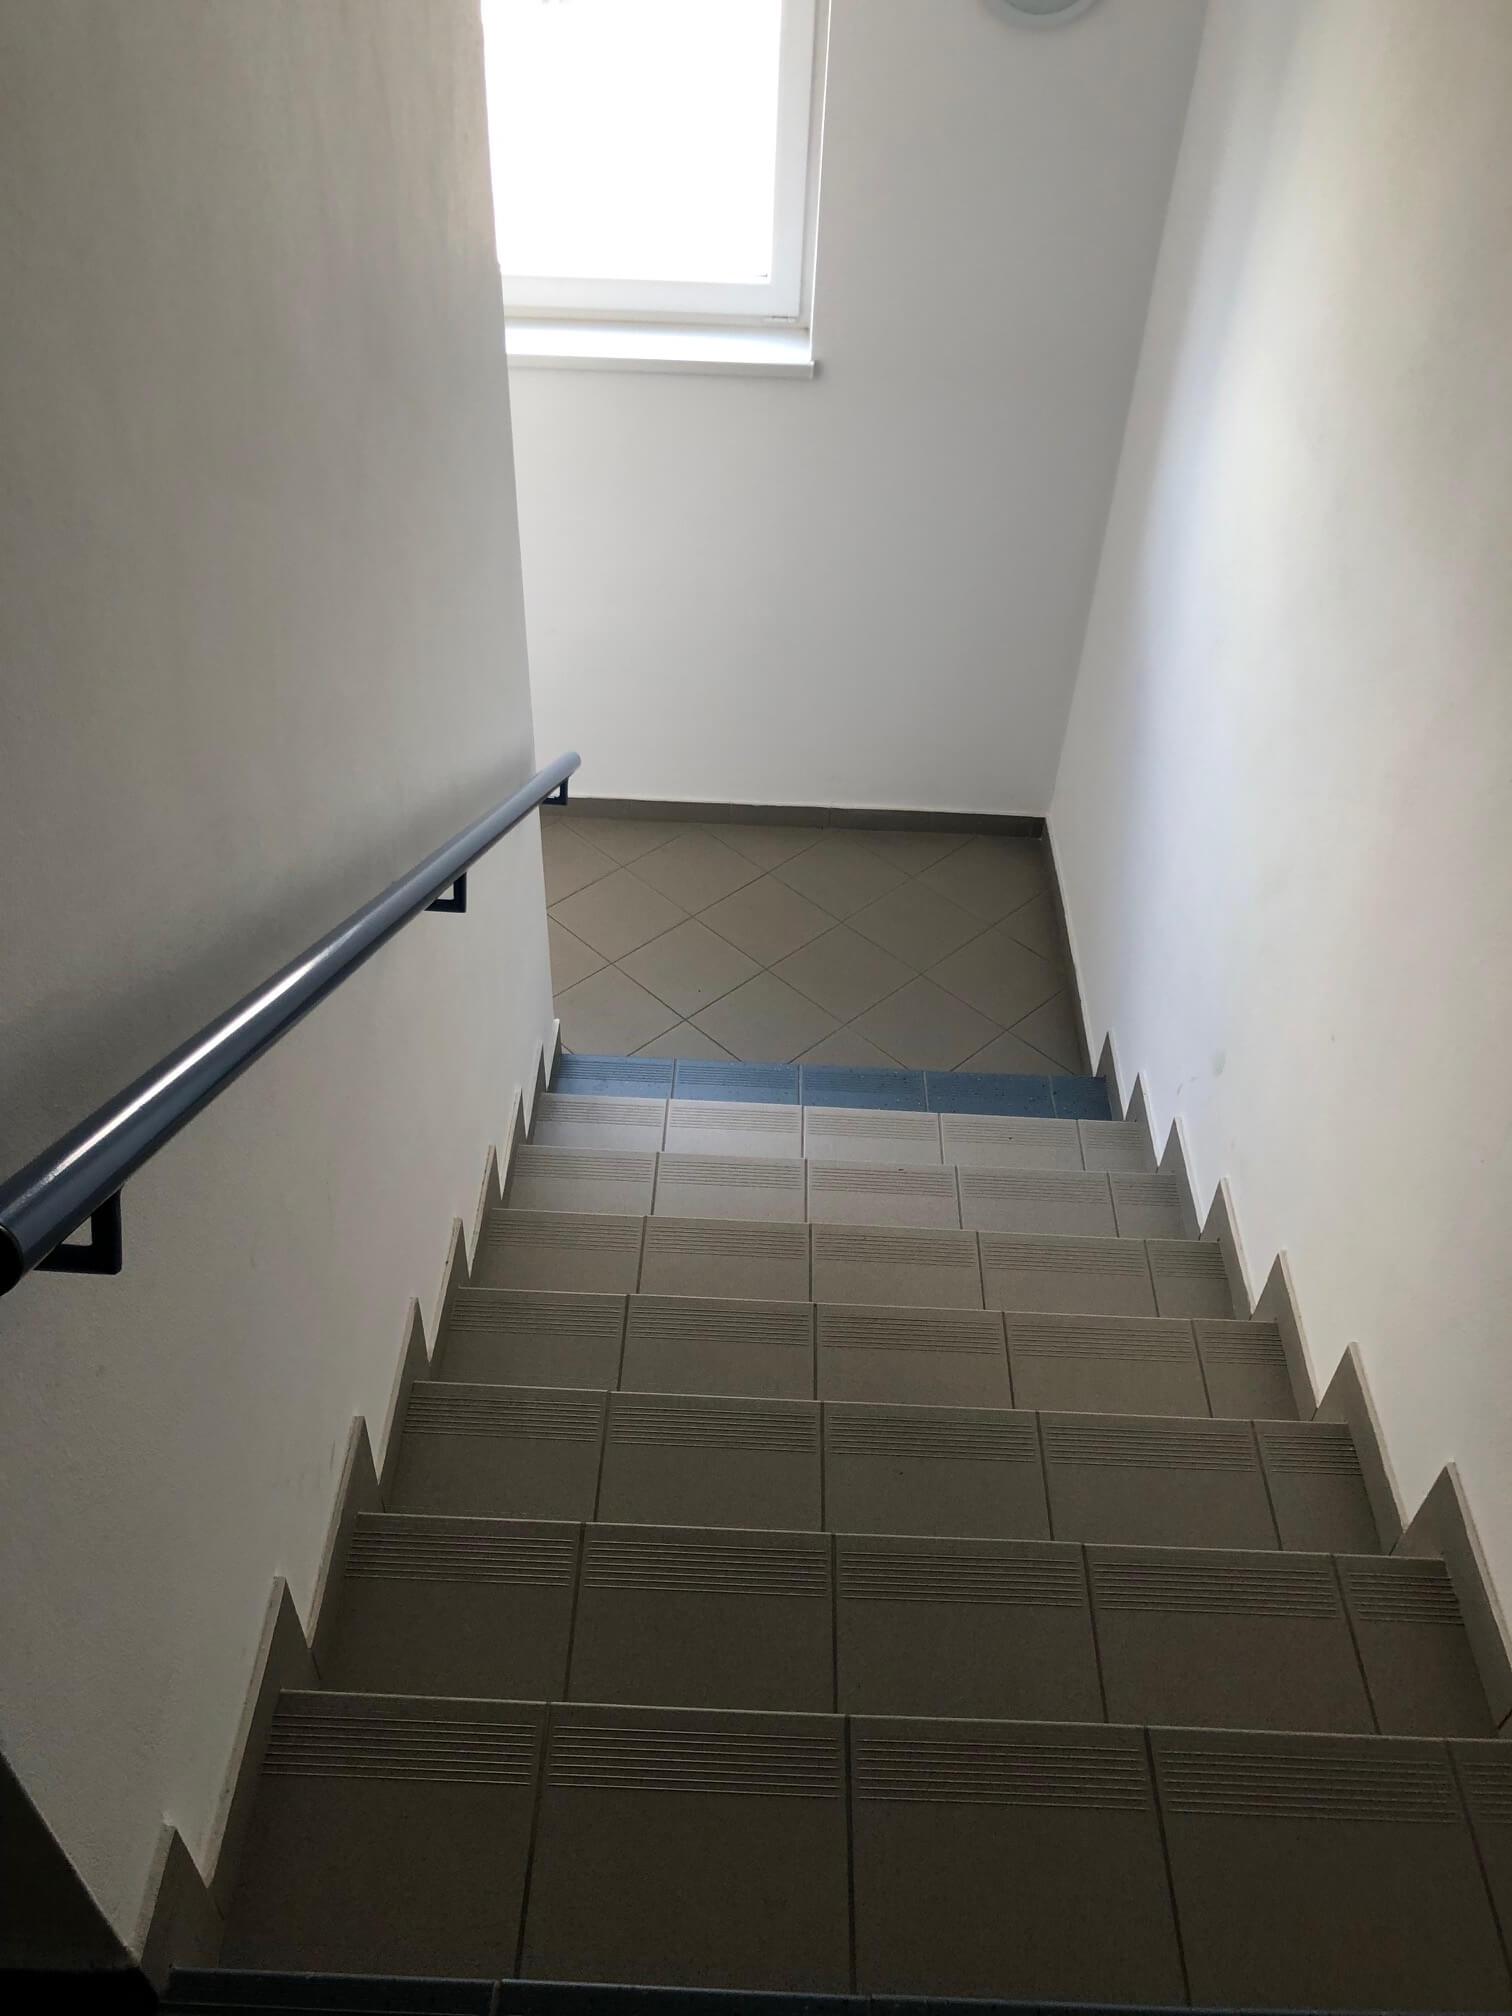 Rezervované: 3 izbový byt, novostavba, 72,25m2, loggia 4,82m2, Staré Grunty, Karlovka, garážové státie-47